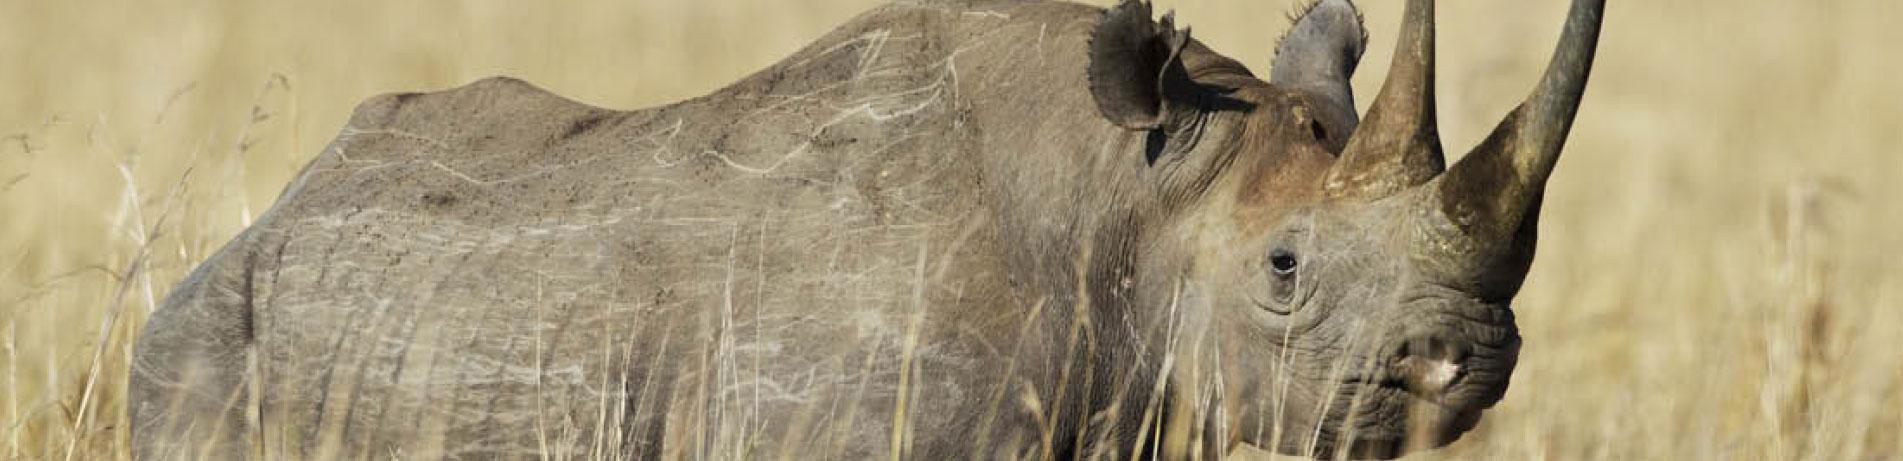 Black rhino in the wild